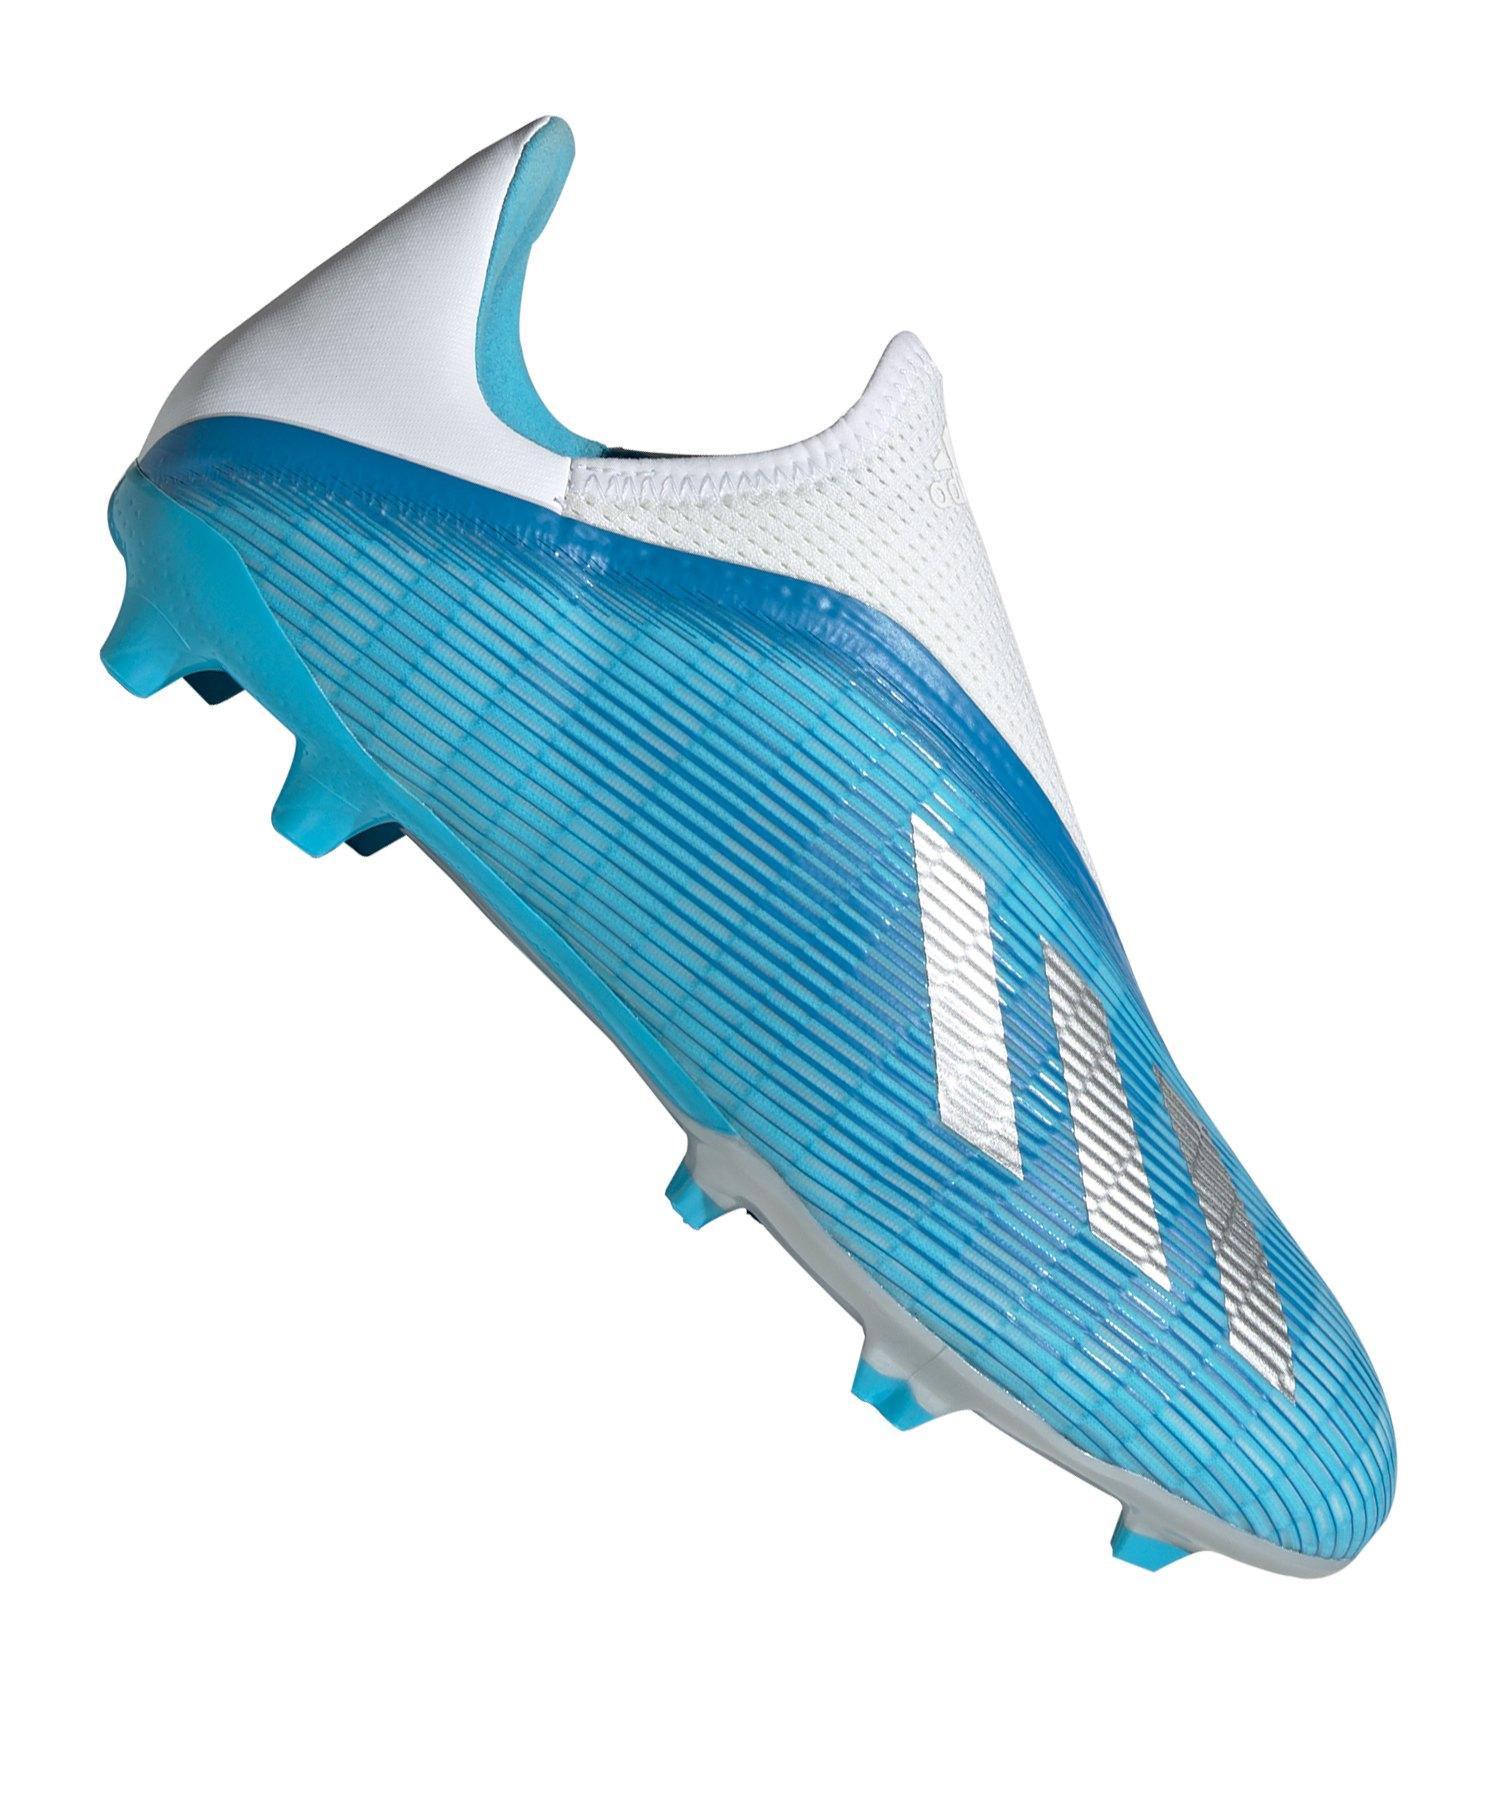 adidas-x-16-2-fg-fussballschuhe-herren